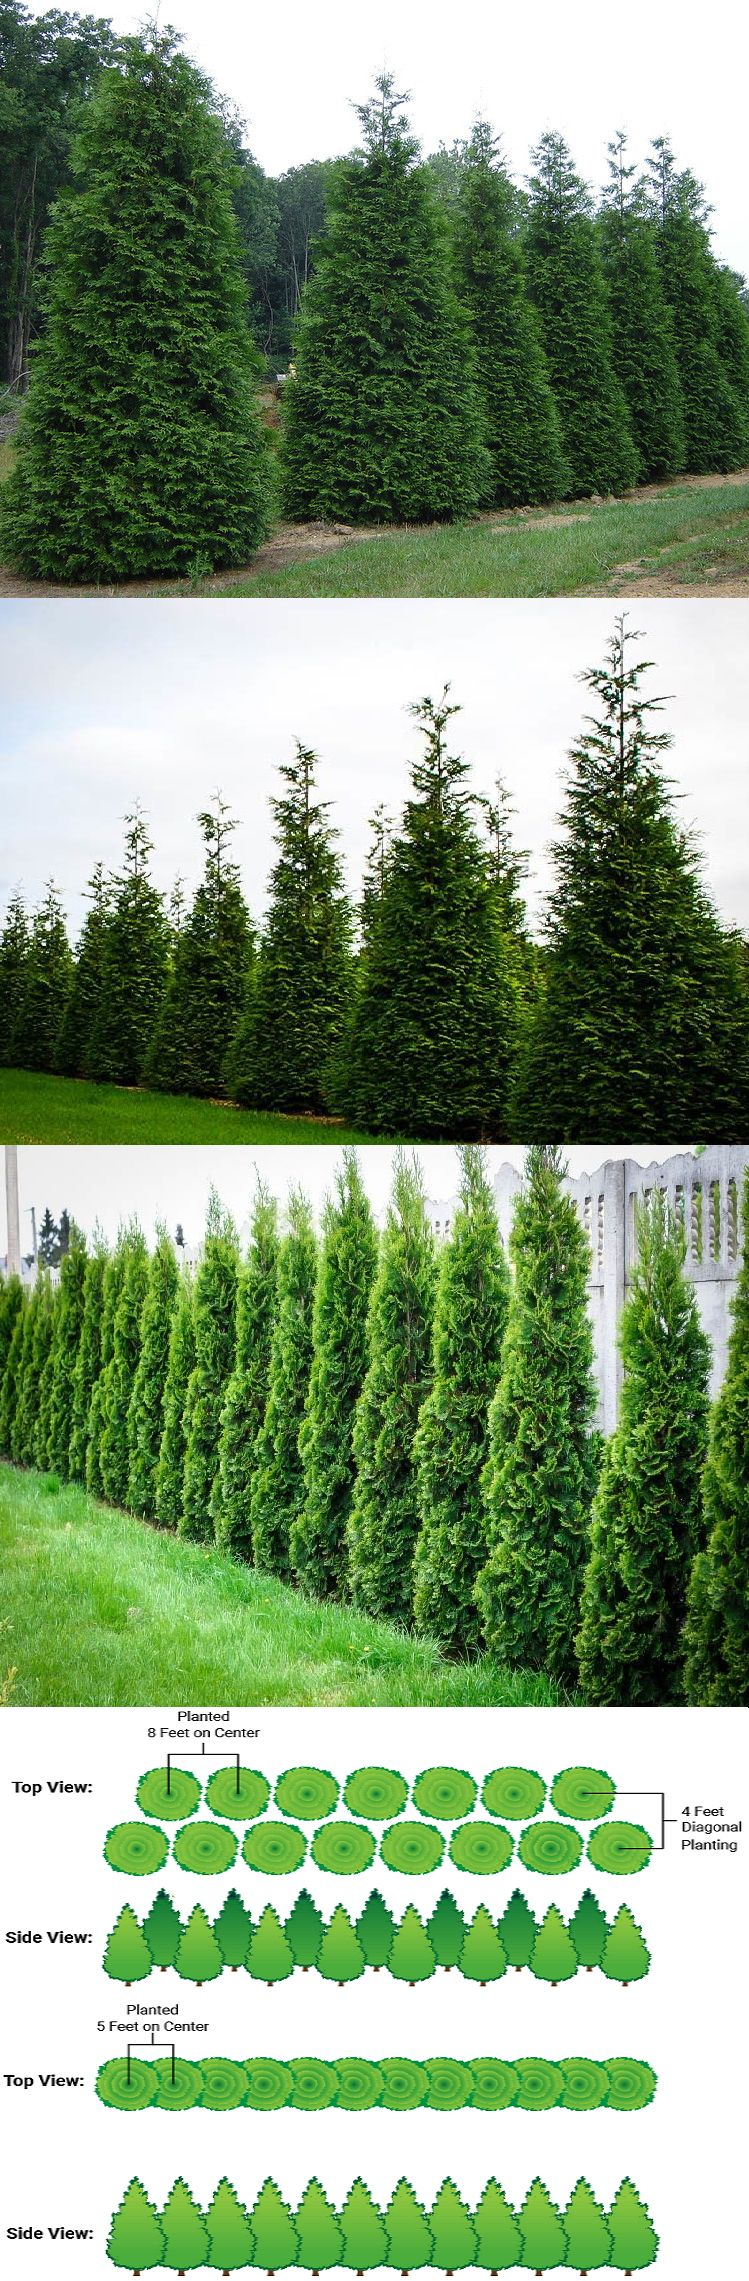 Pin By 4mauntie On Garden In 2020 Arborvitae Privacy Plants Arborvitae Tree